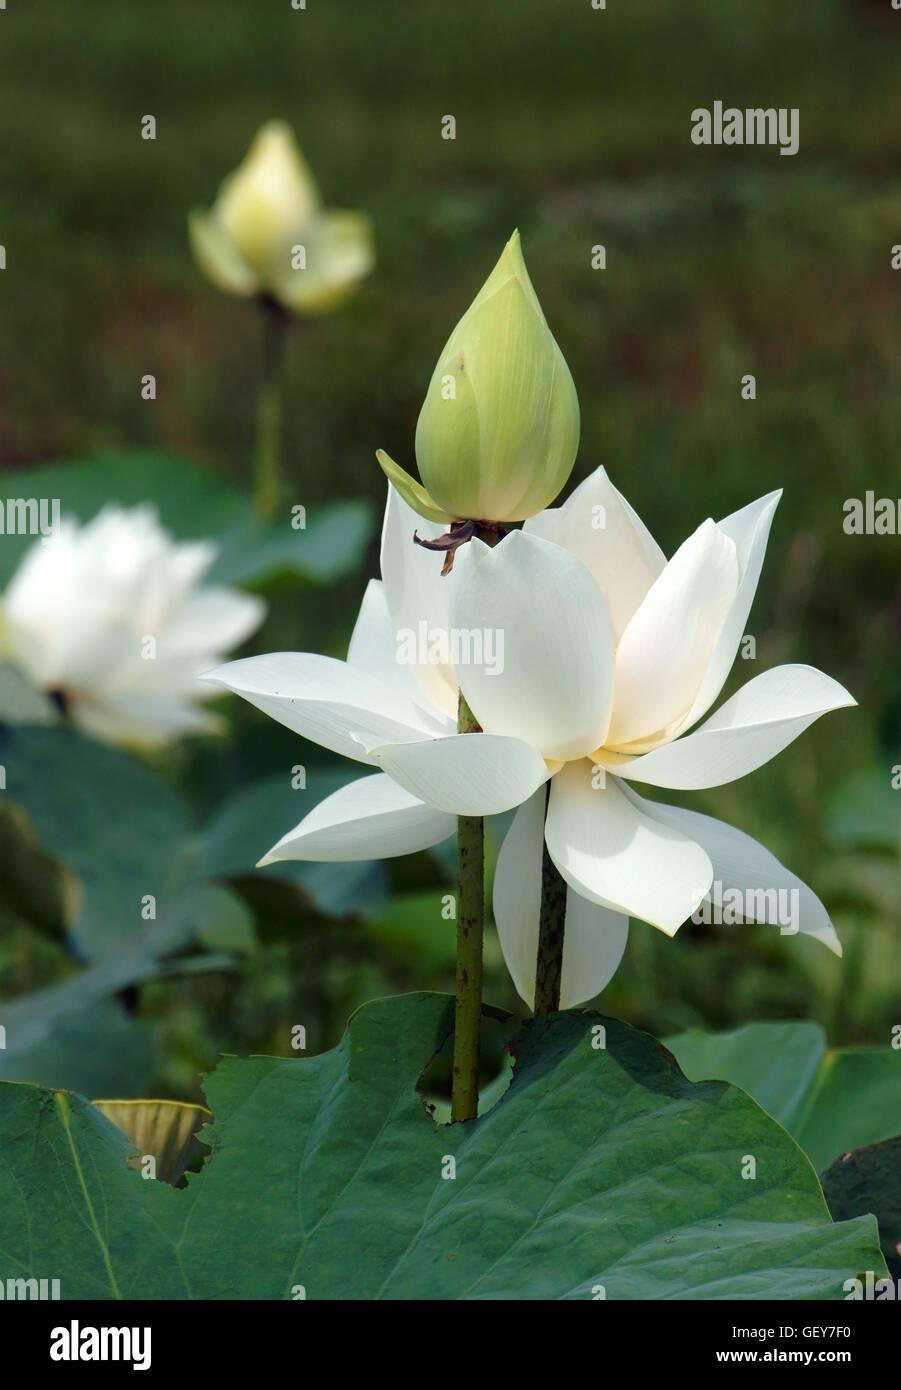 Vietnamese Flower Pure White Lotus Flower Symbol Of Vietnam At